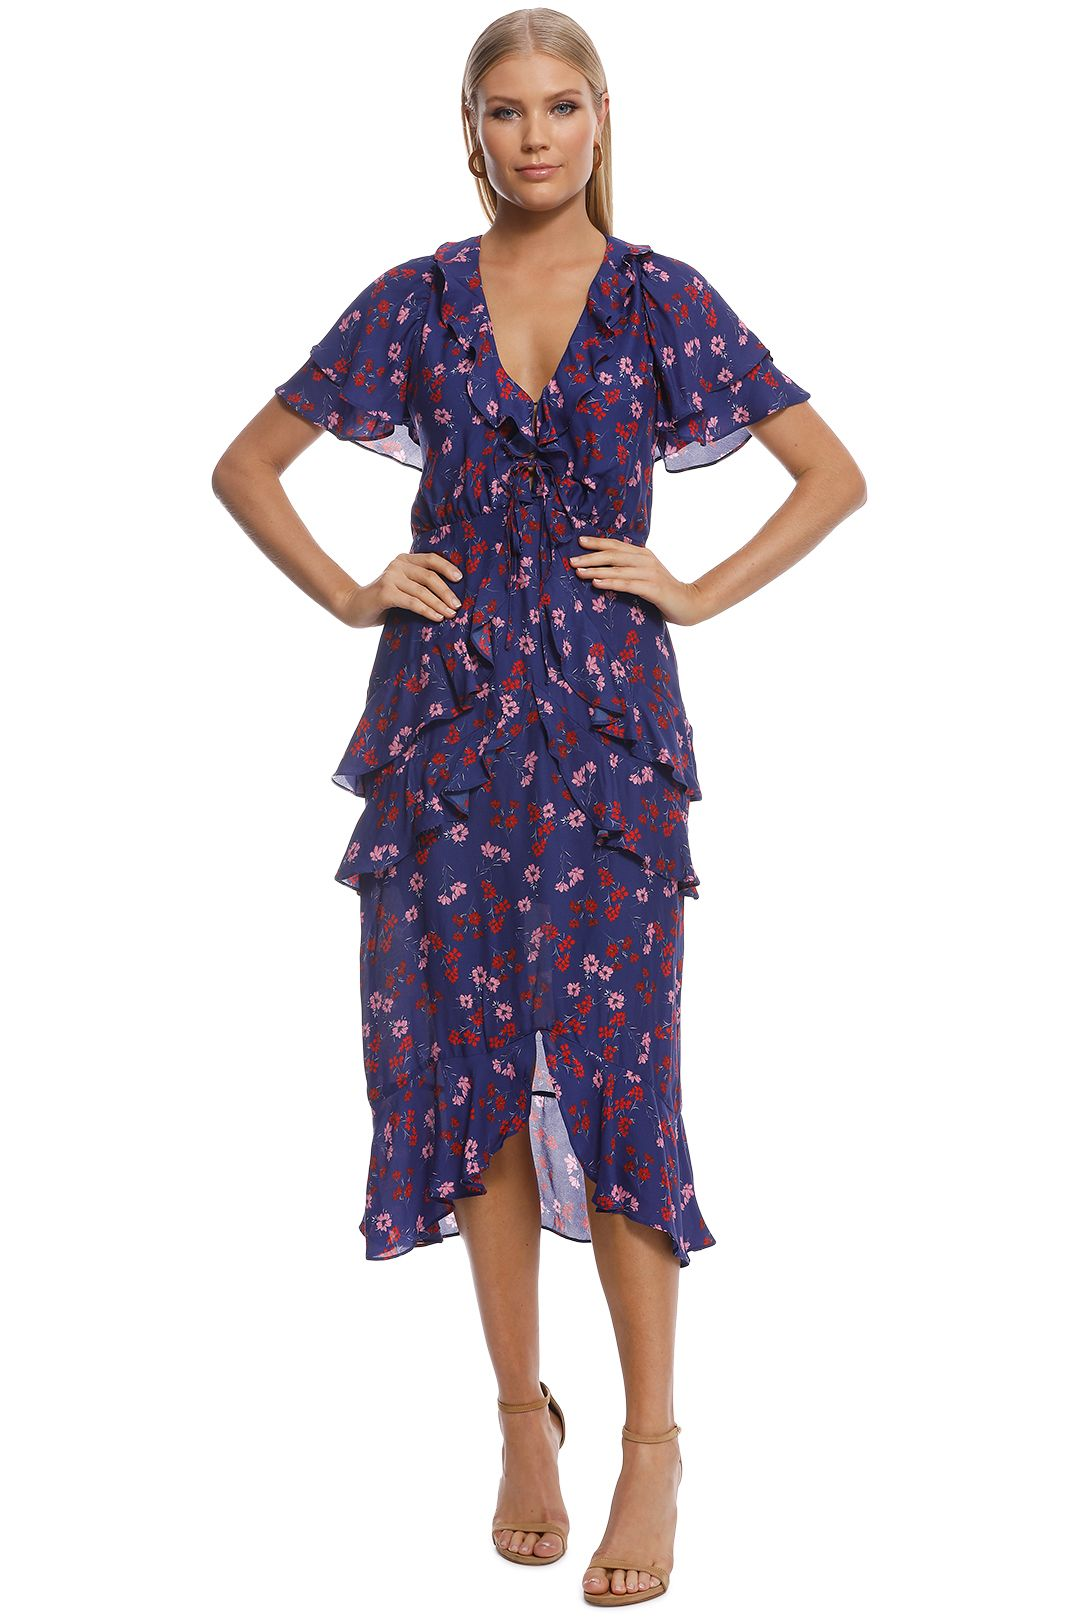 Talulah - The Yearning Ruffle Midi Dress - Blue - Front